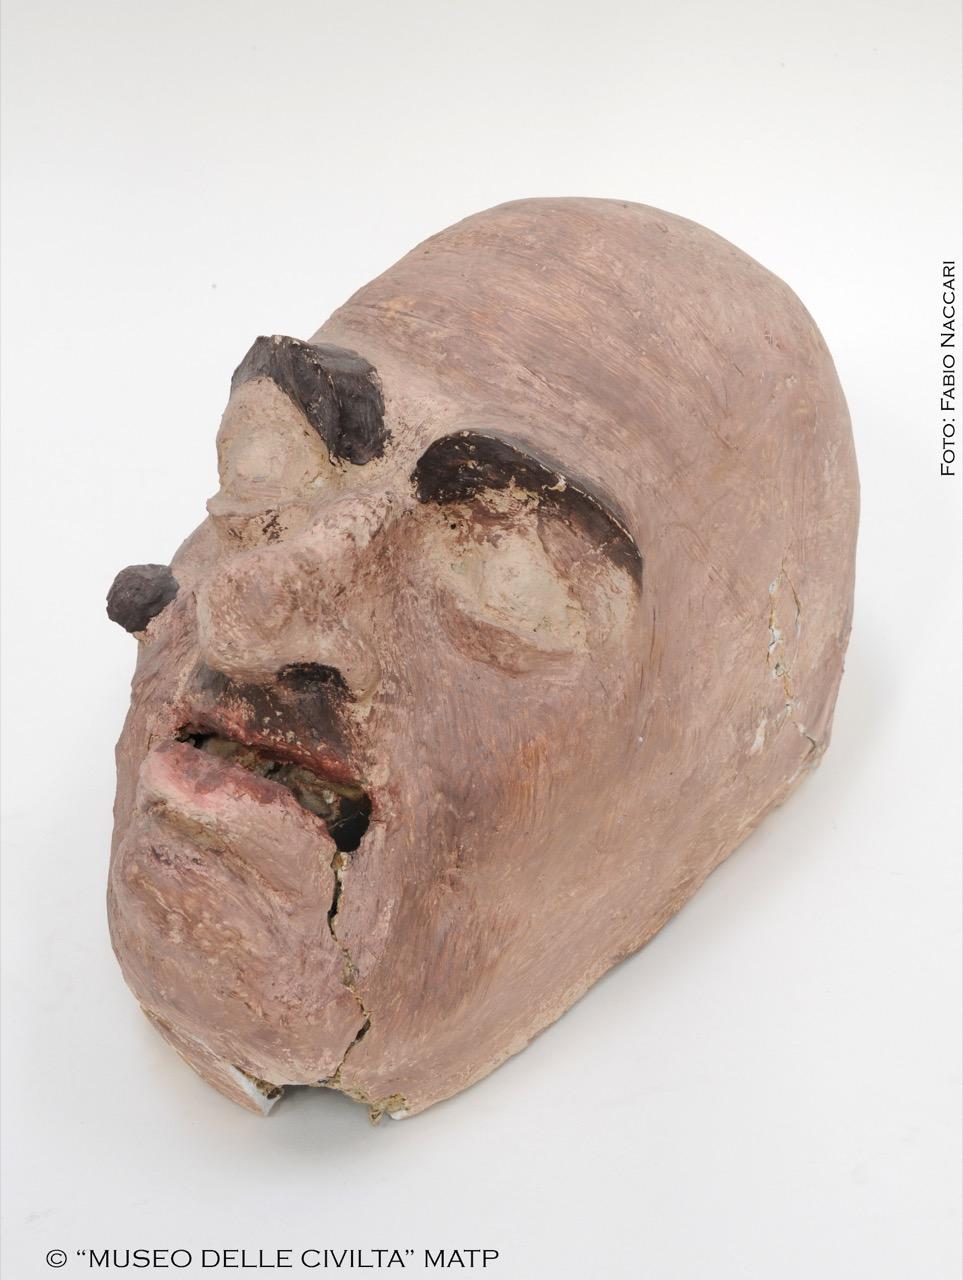 Maschera - Costume di Battì, di carnevale, RITUALITÀ/ ABITI MAGICO-RITUALI-CERIMONIALI